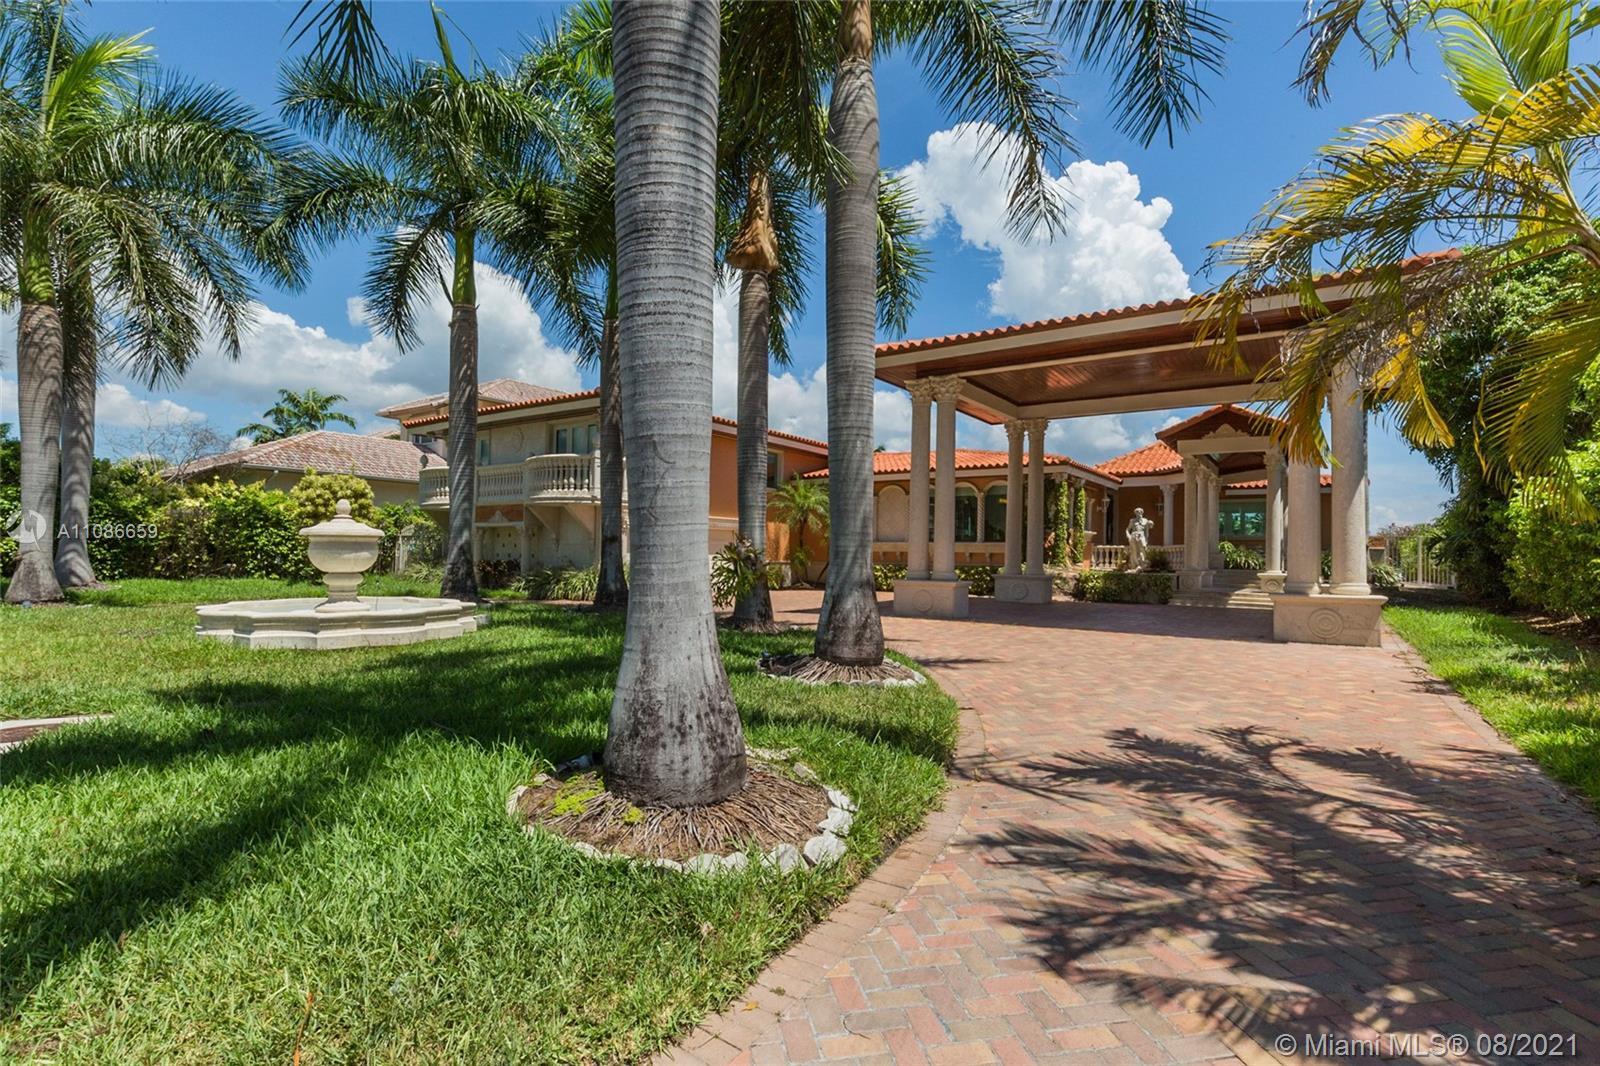 1249 Biscaya Dr Luxury Real Estate